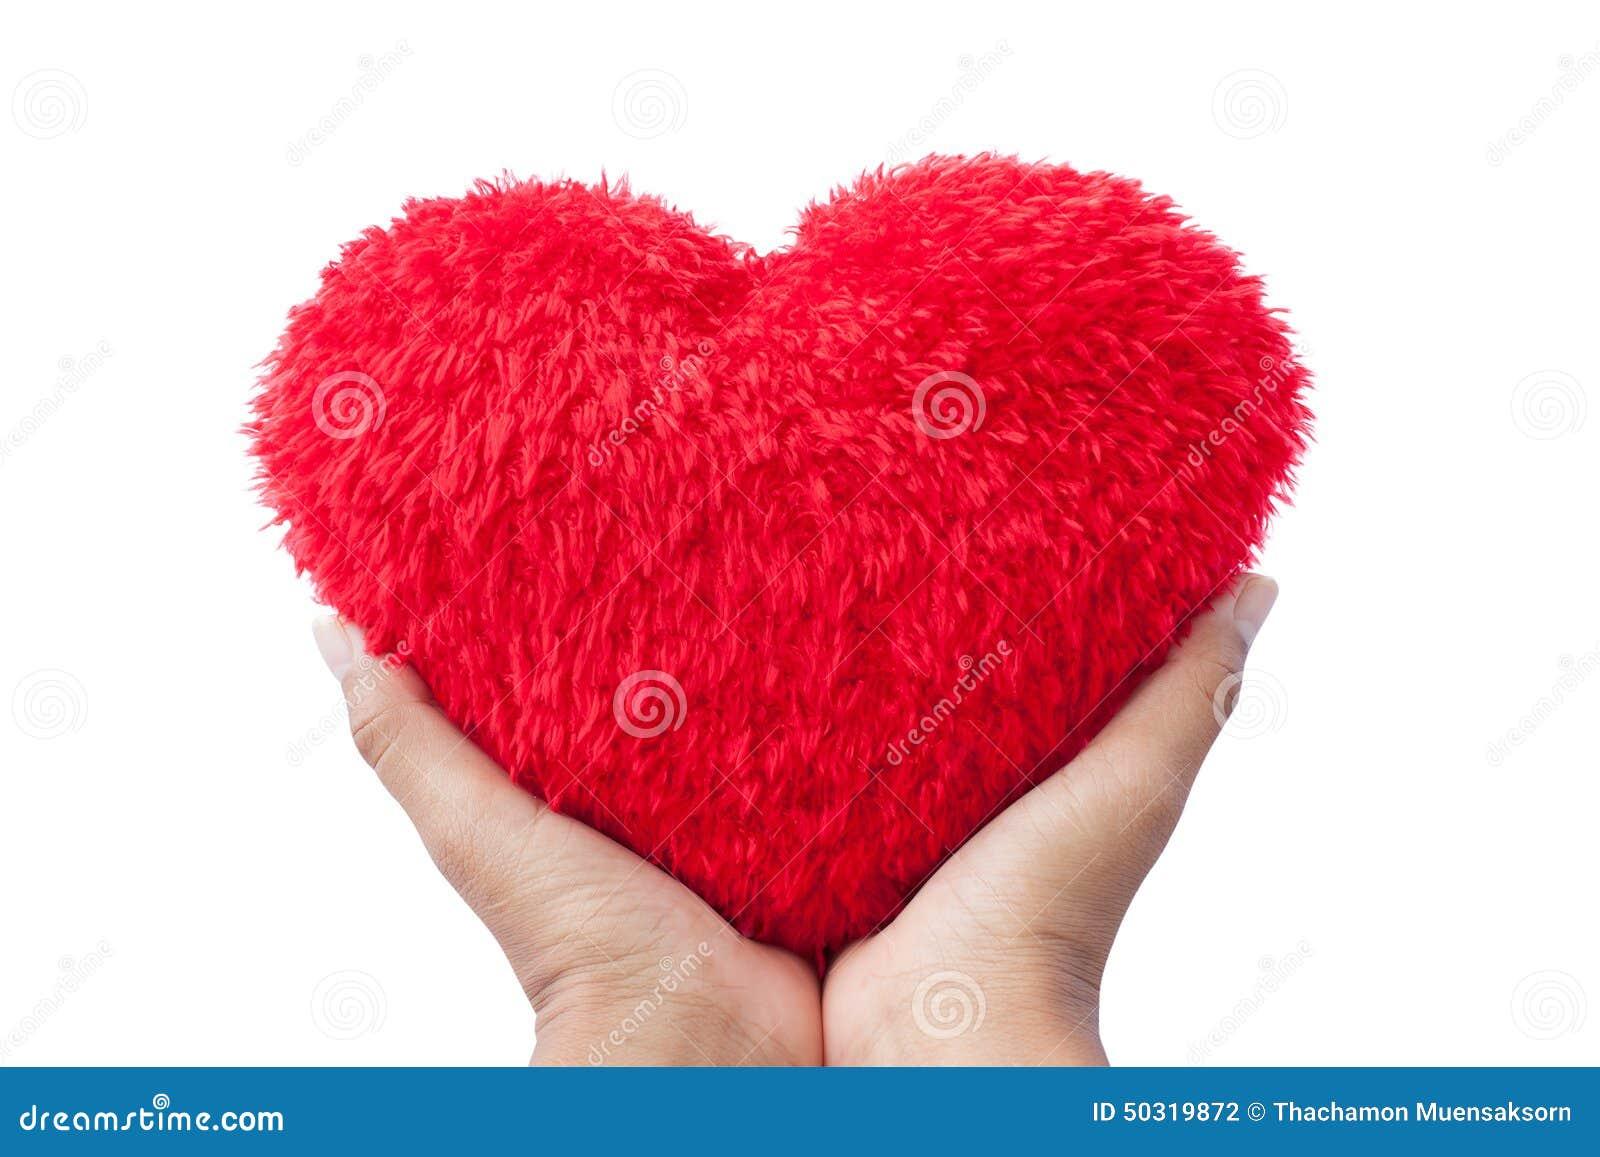 online dating handgrepen gratis online dating sites Lethbridge